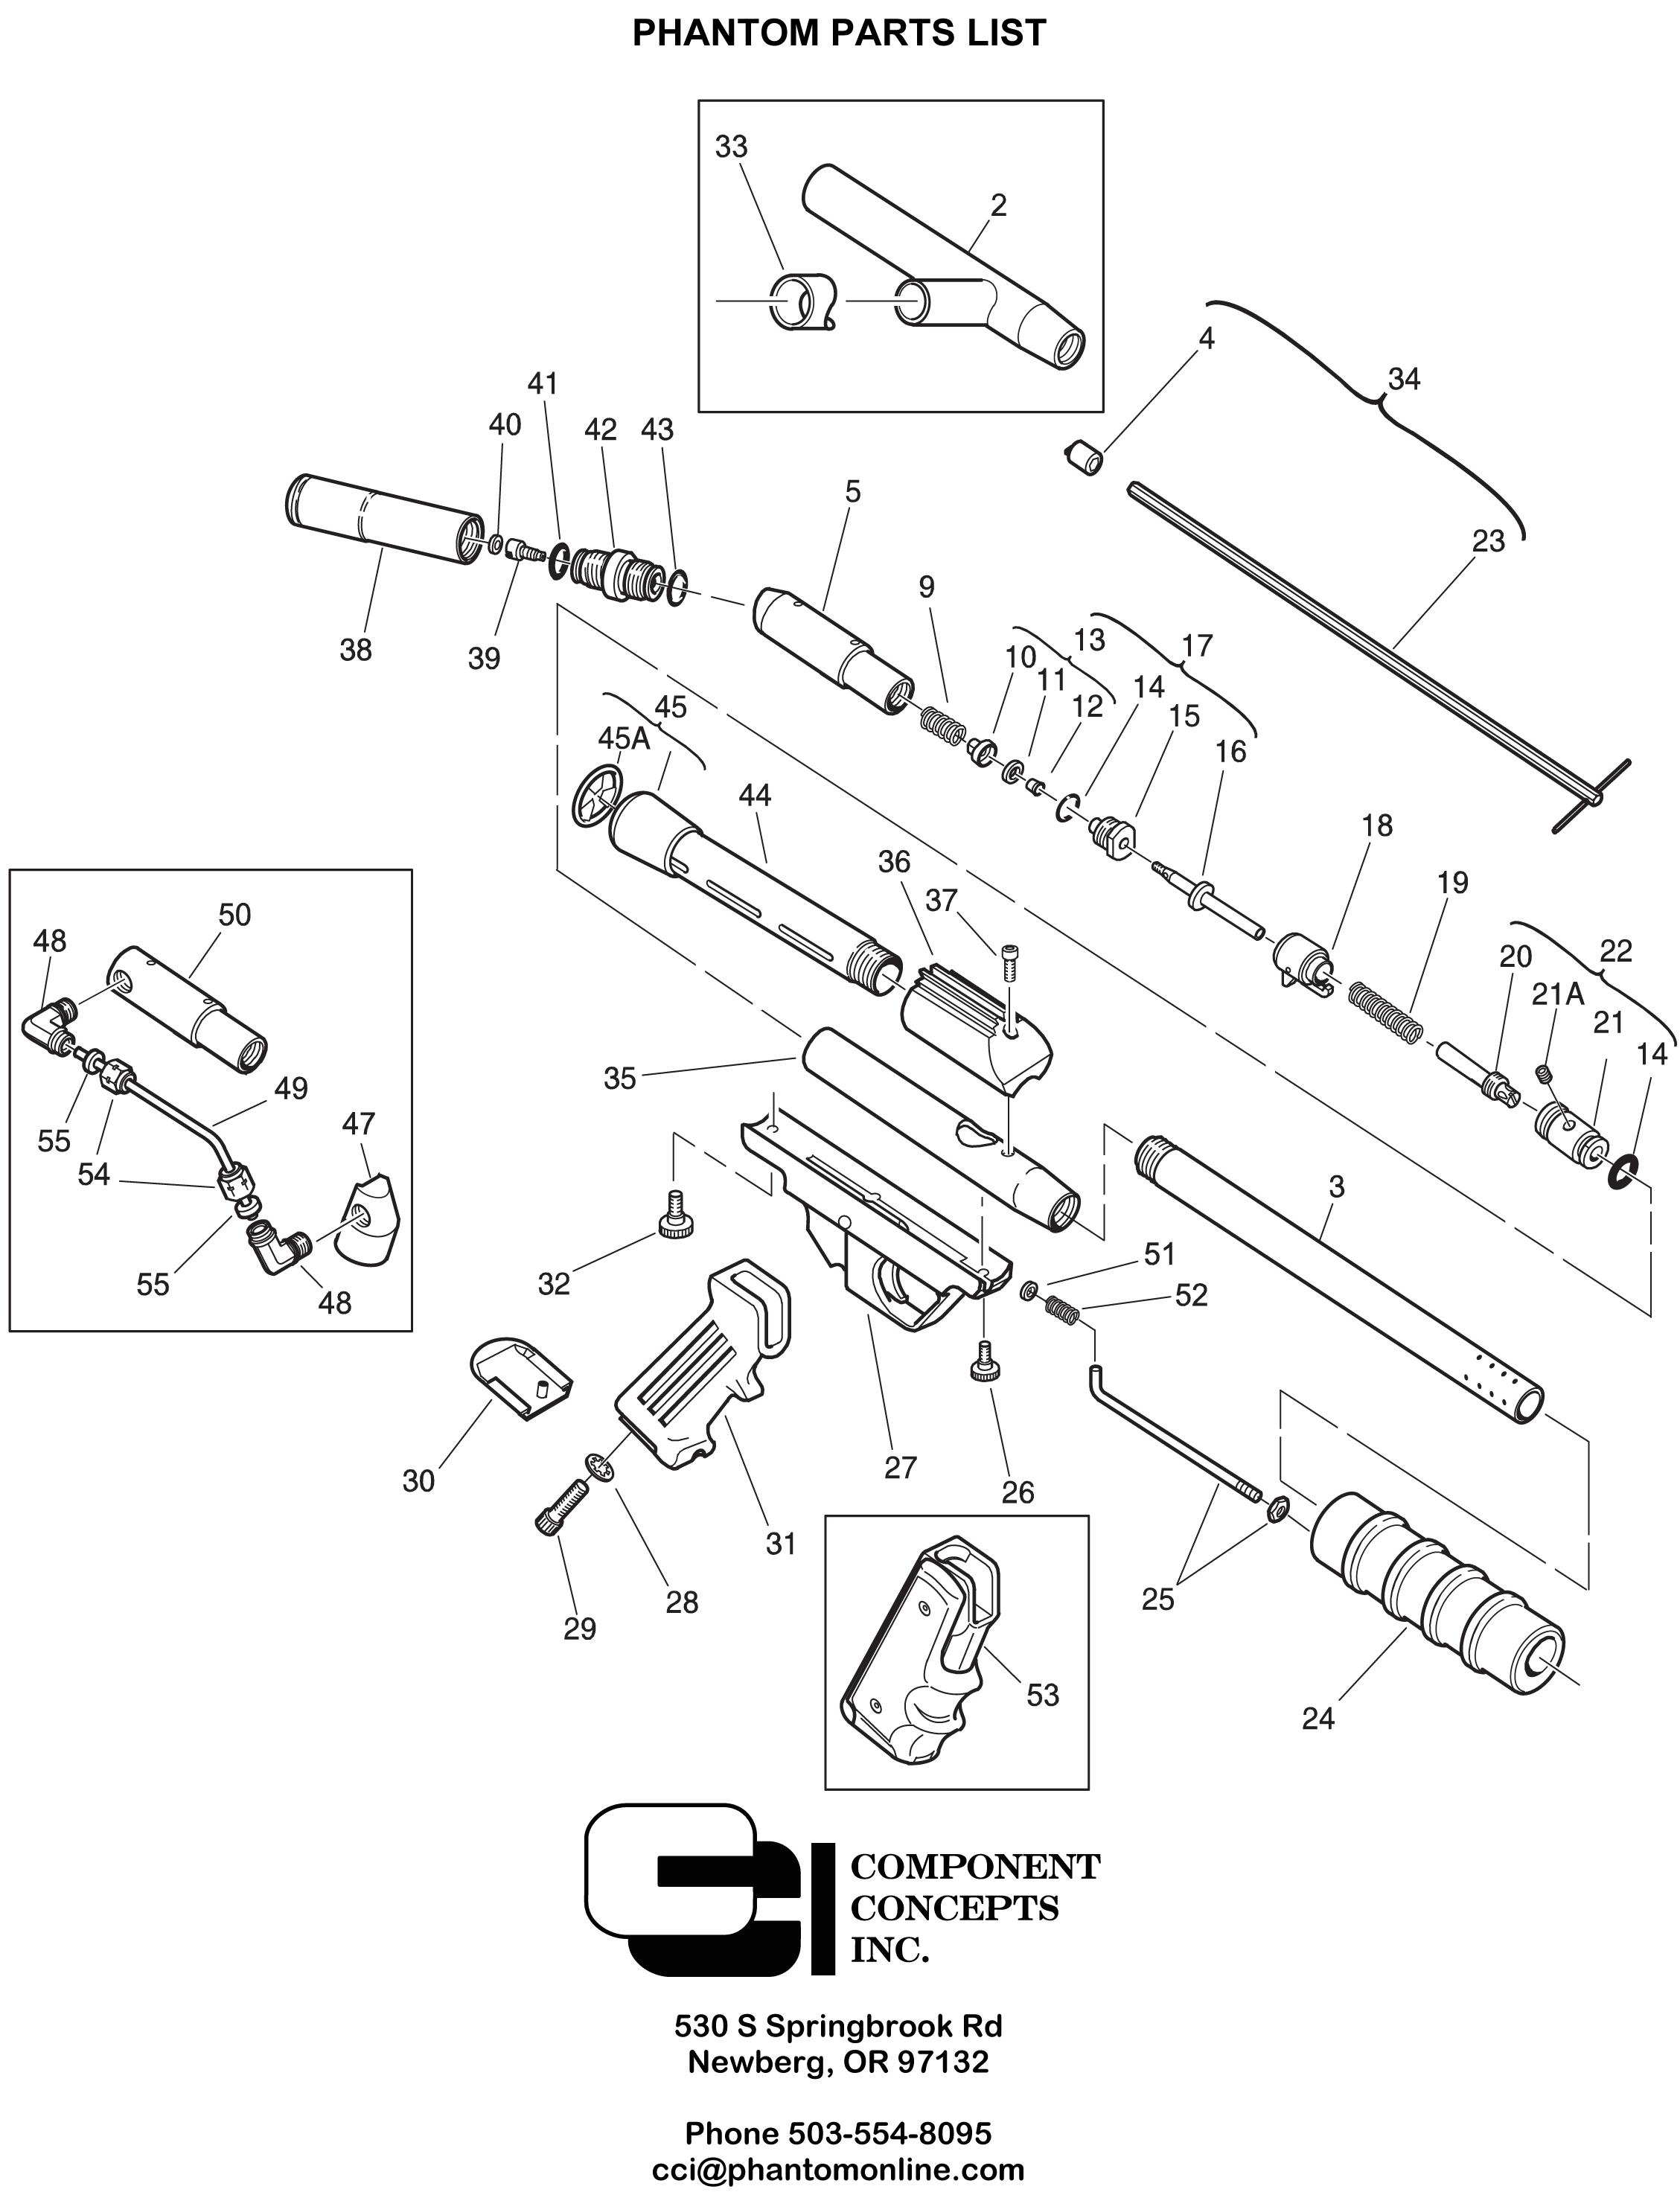 Bolt Rod Assembly Component Concepts Inc Engine Diagram